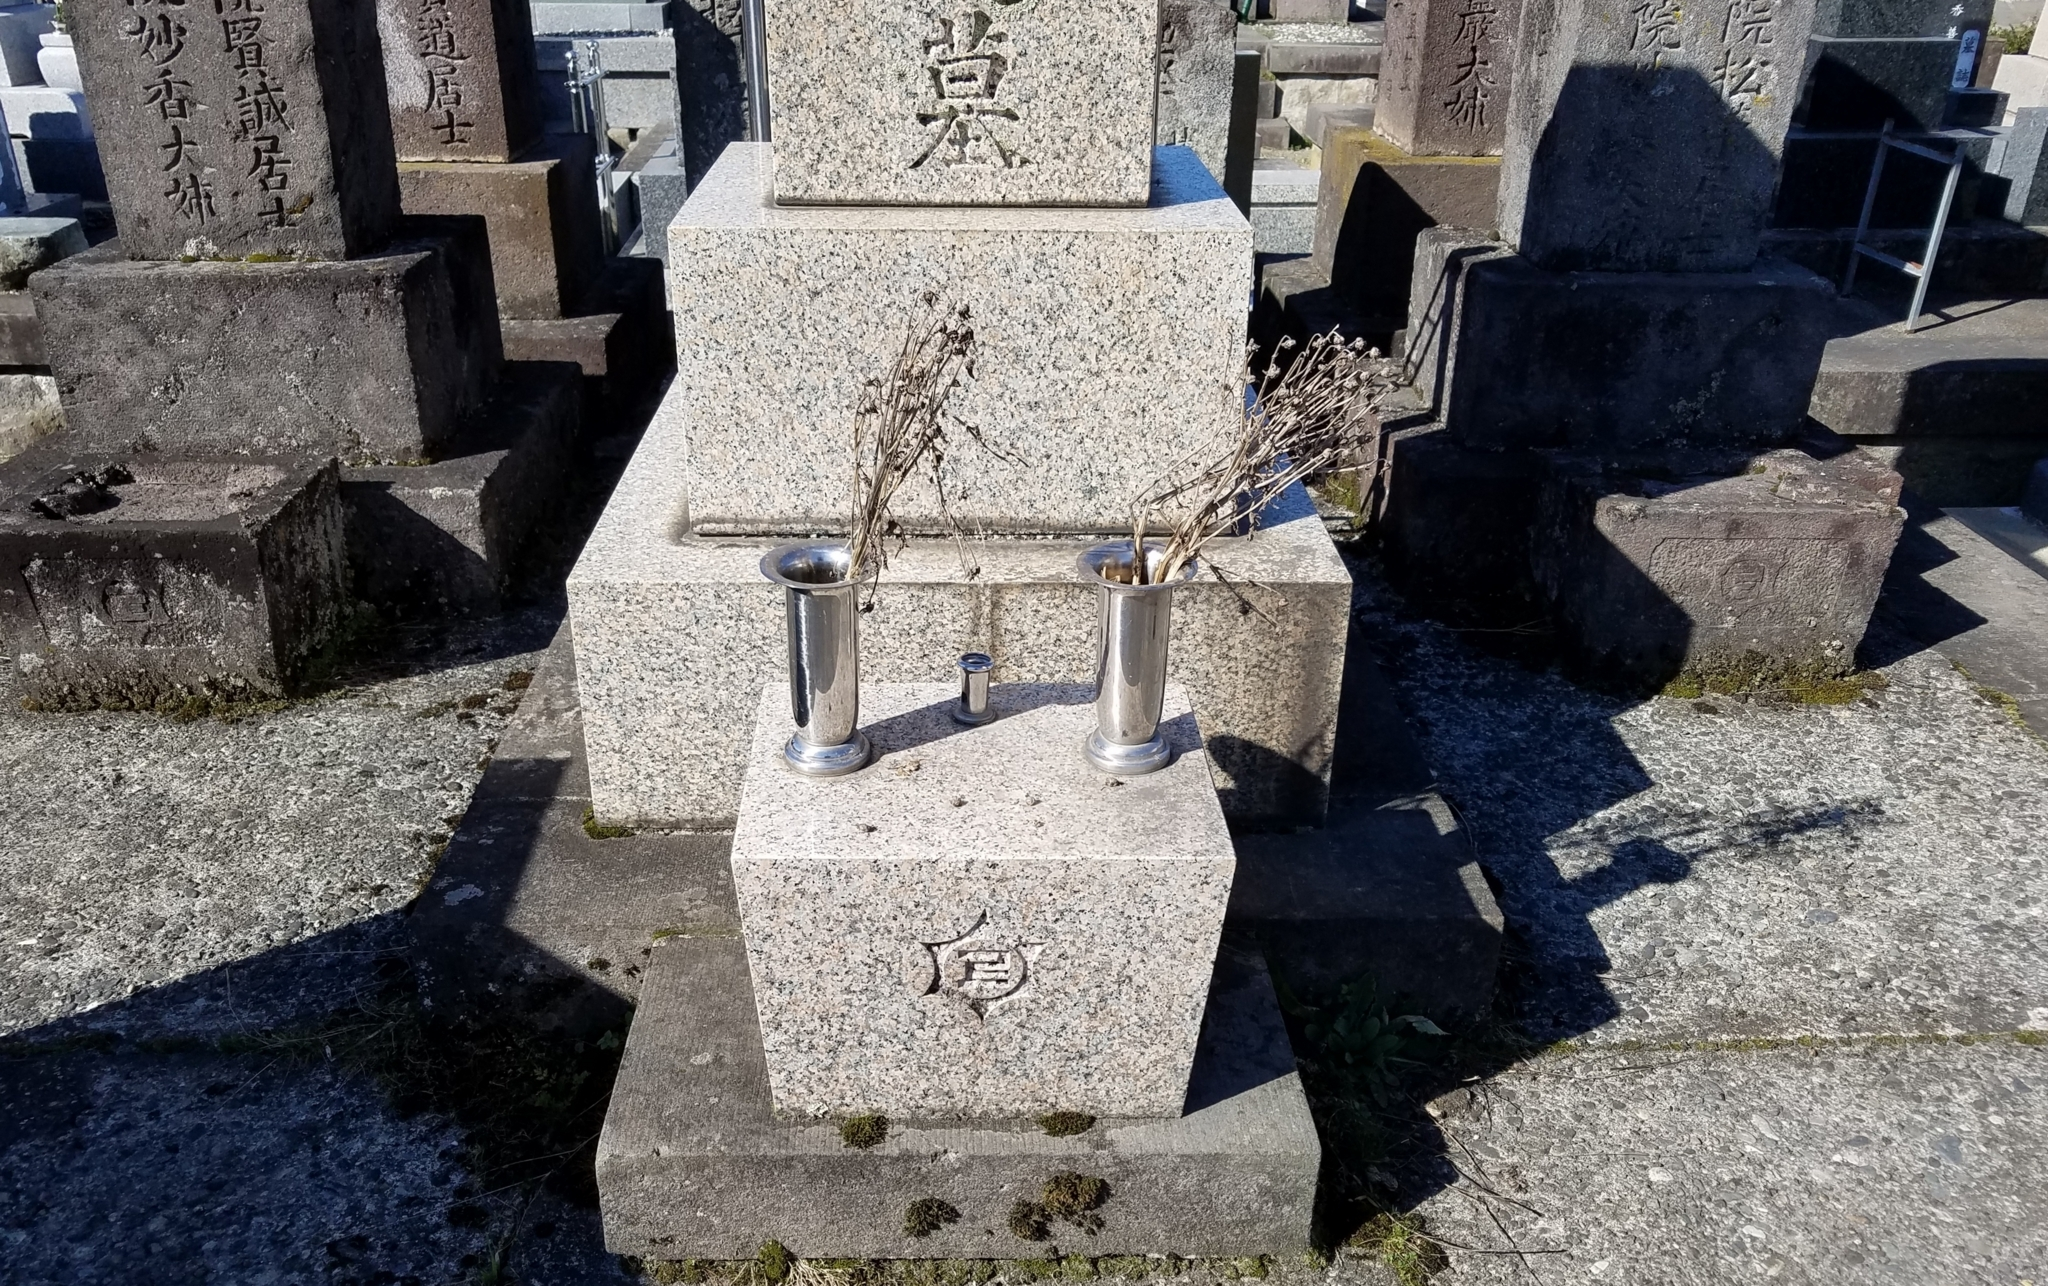 f:id:ToshUeno:20180330145722j:plain